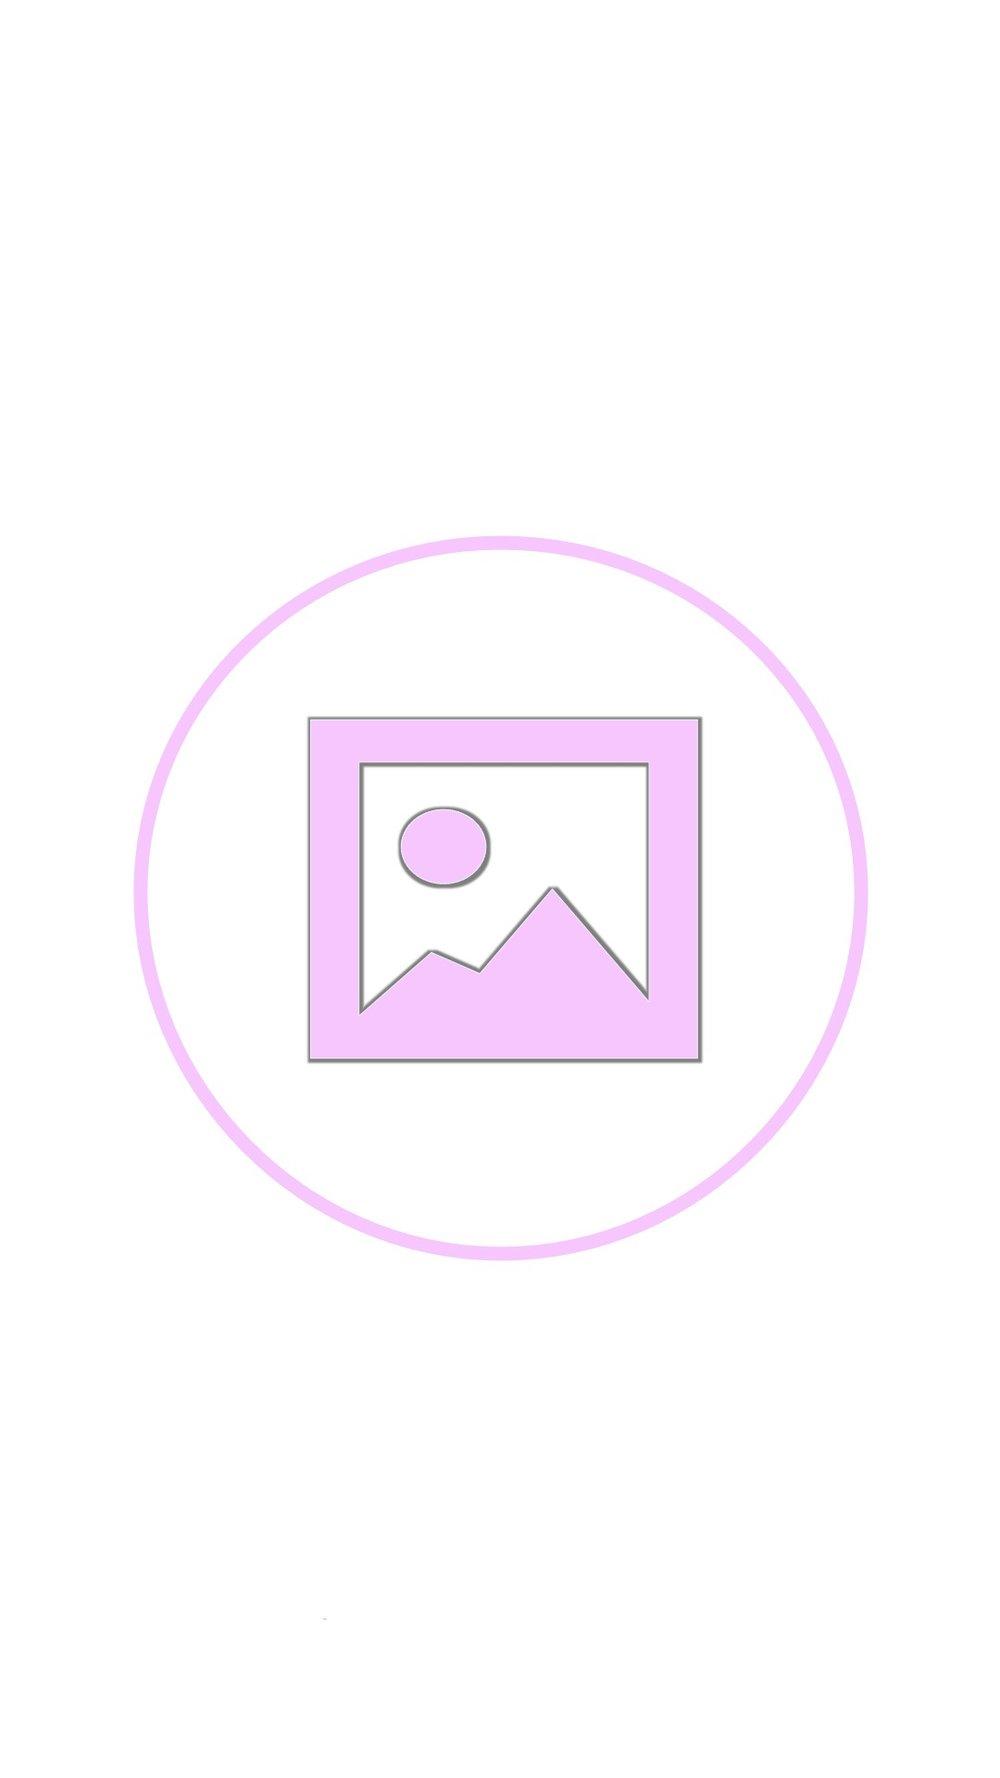 Instagram-cover-photo-pinkwhite-lotnotes.com.jpg